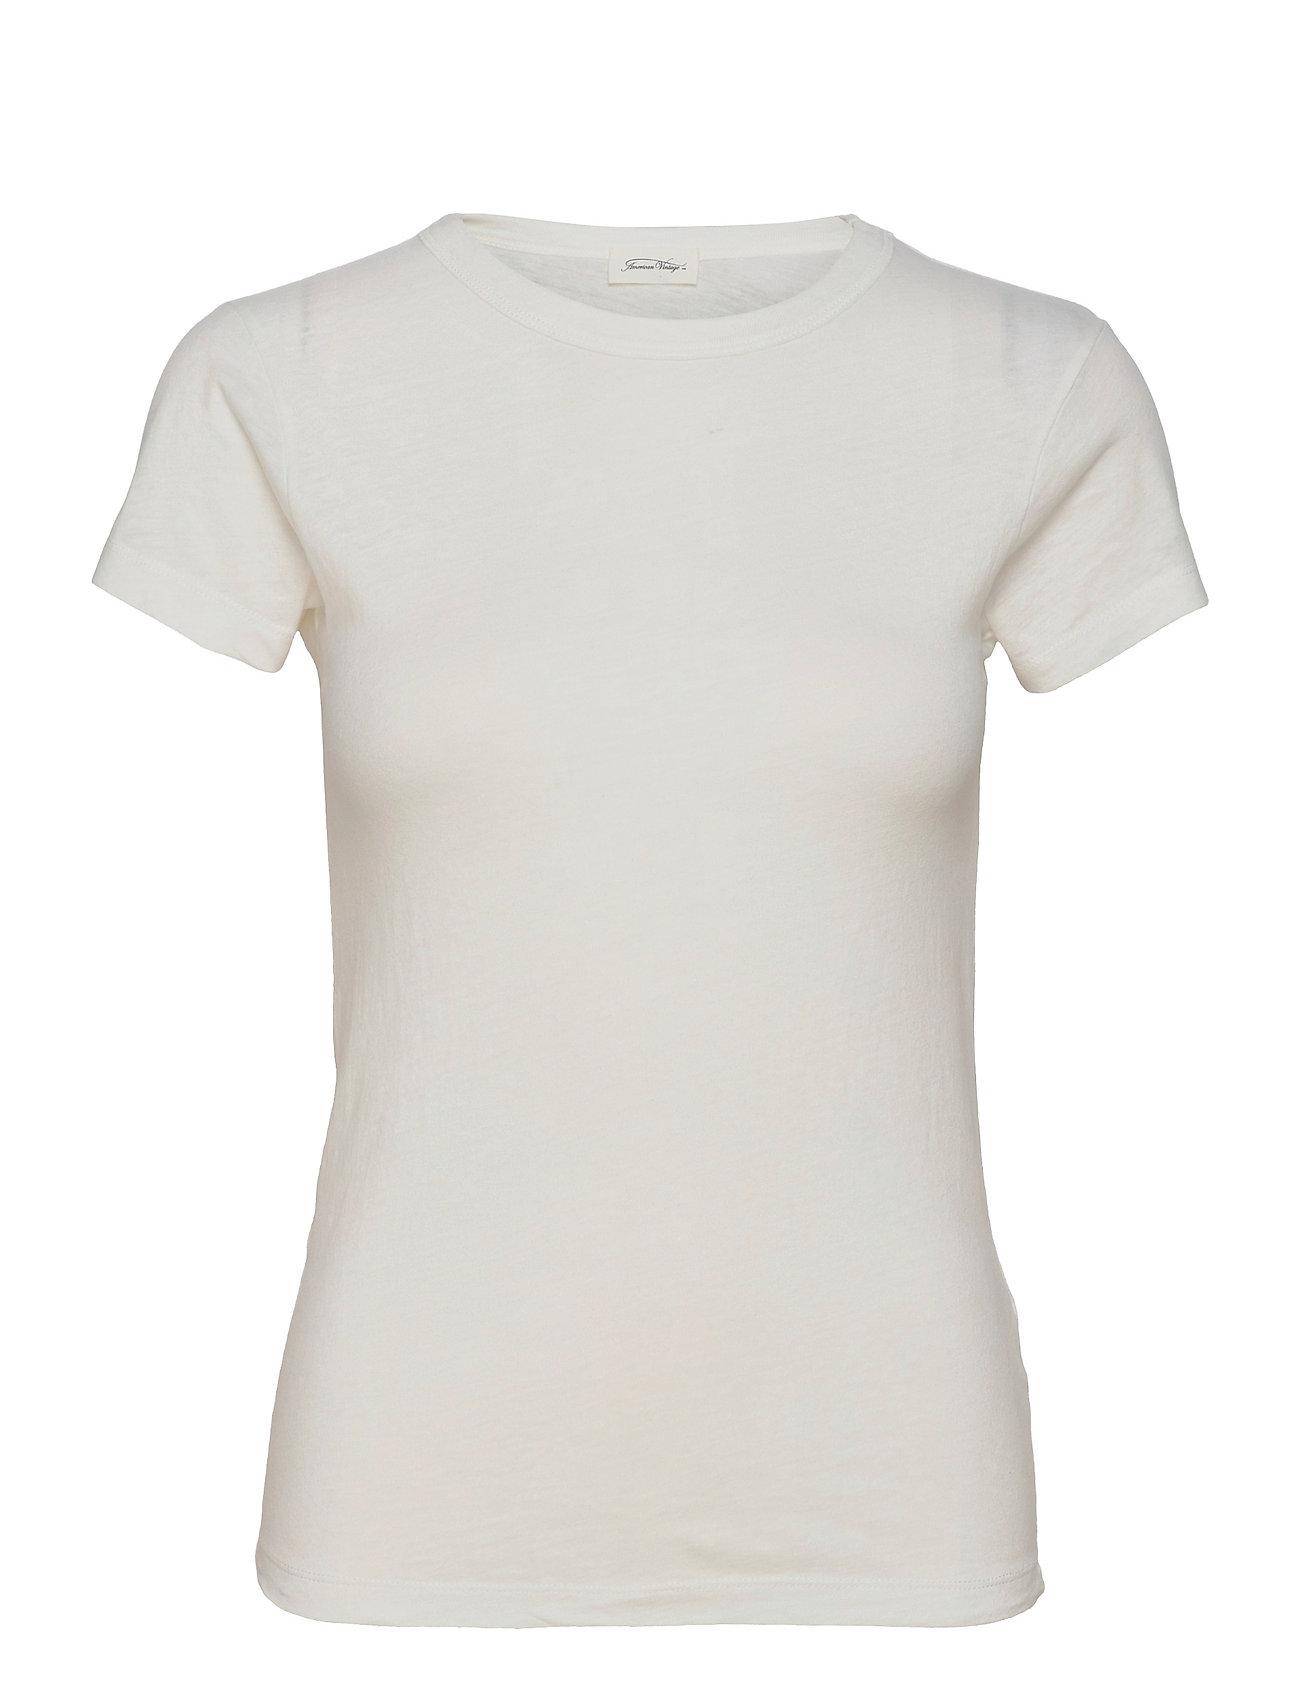 Aksun T-shirt Top Hvid American Vintage